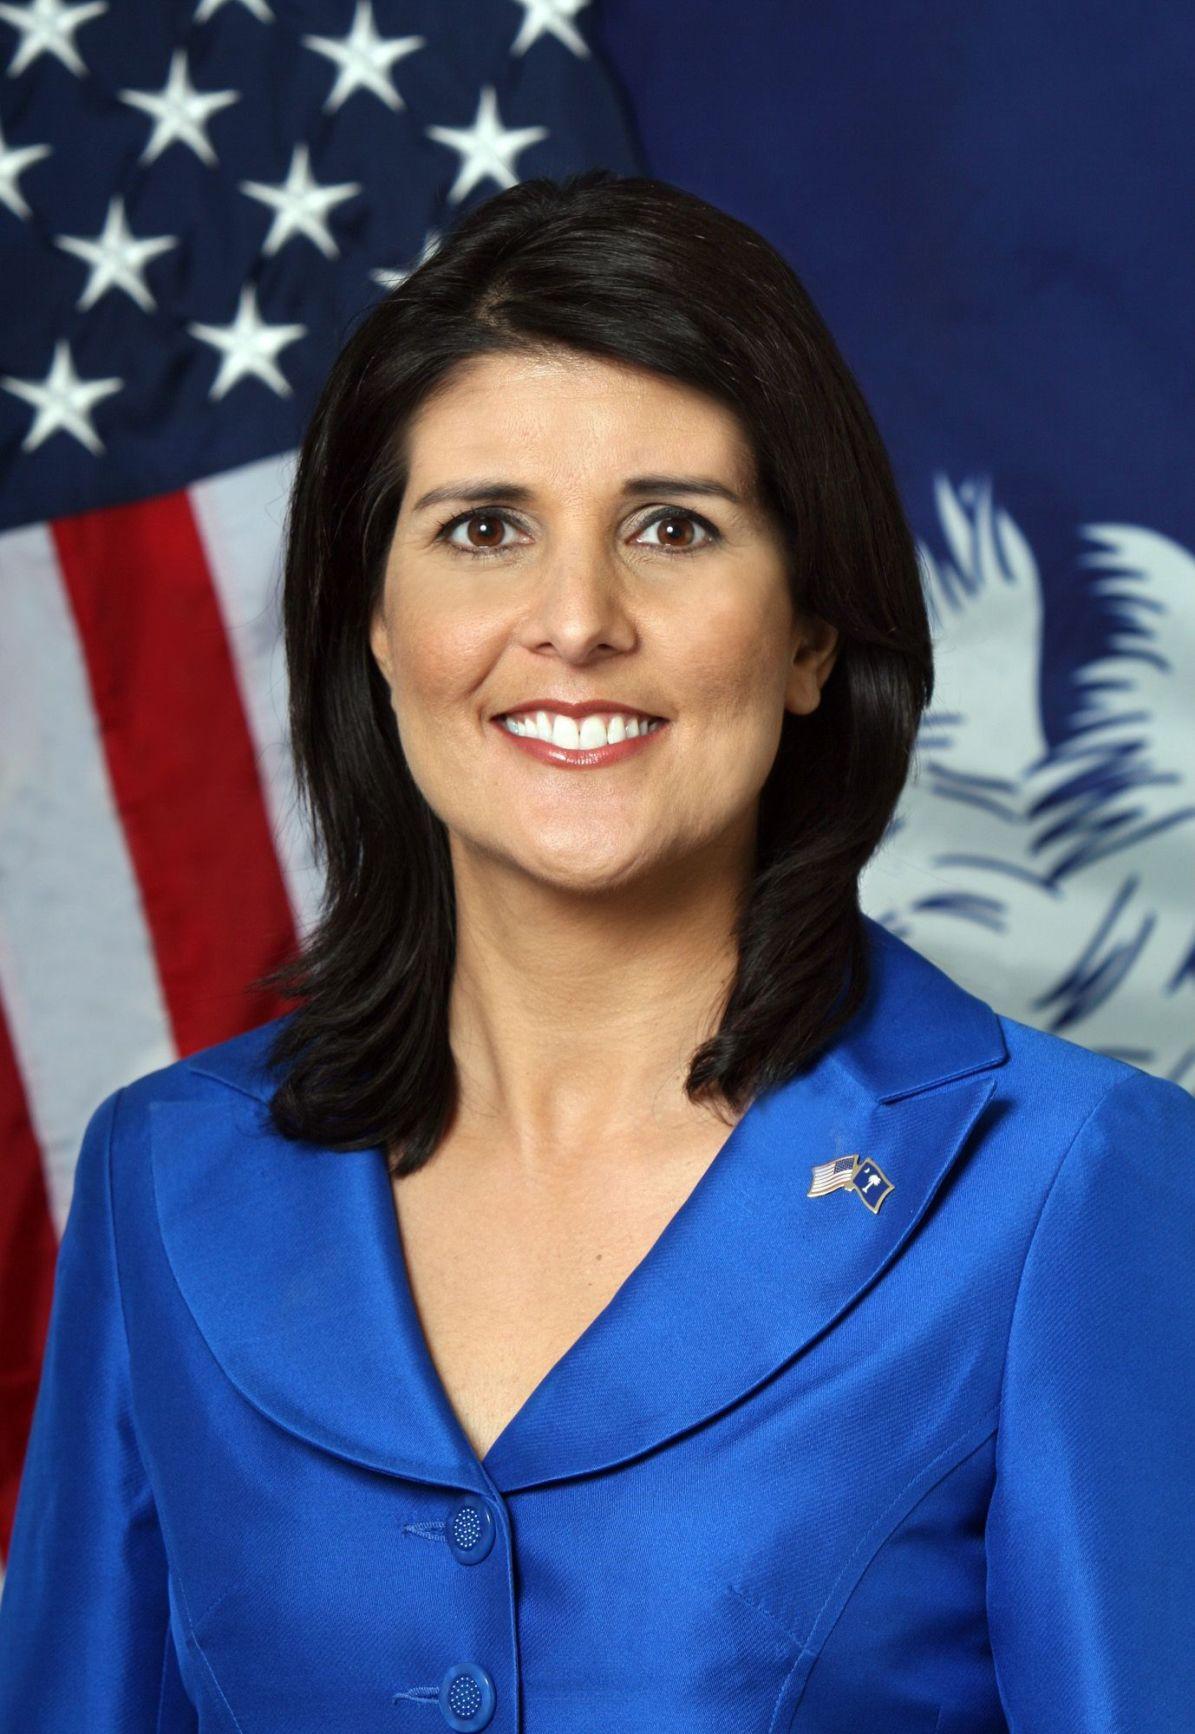 Haley reimburses security costs